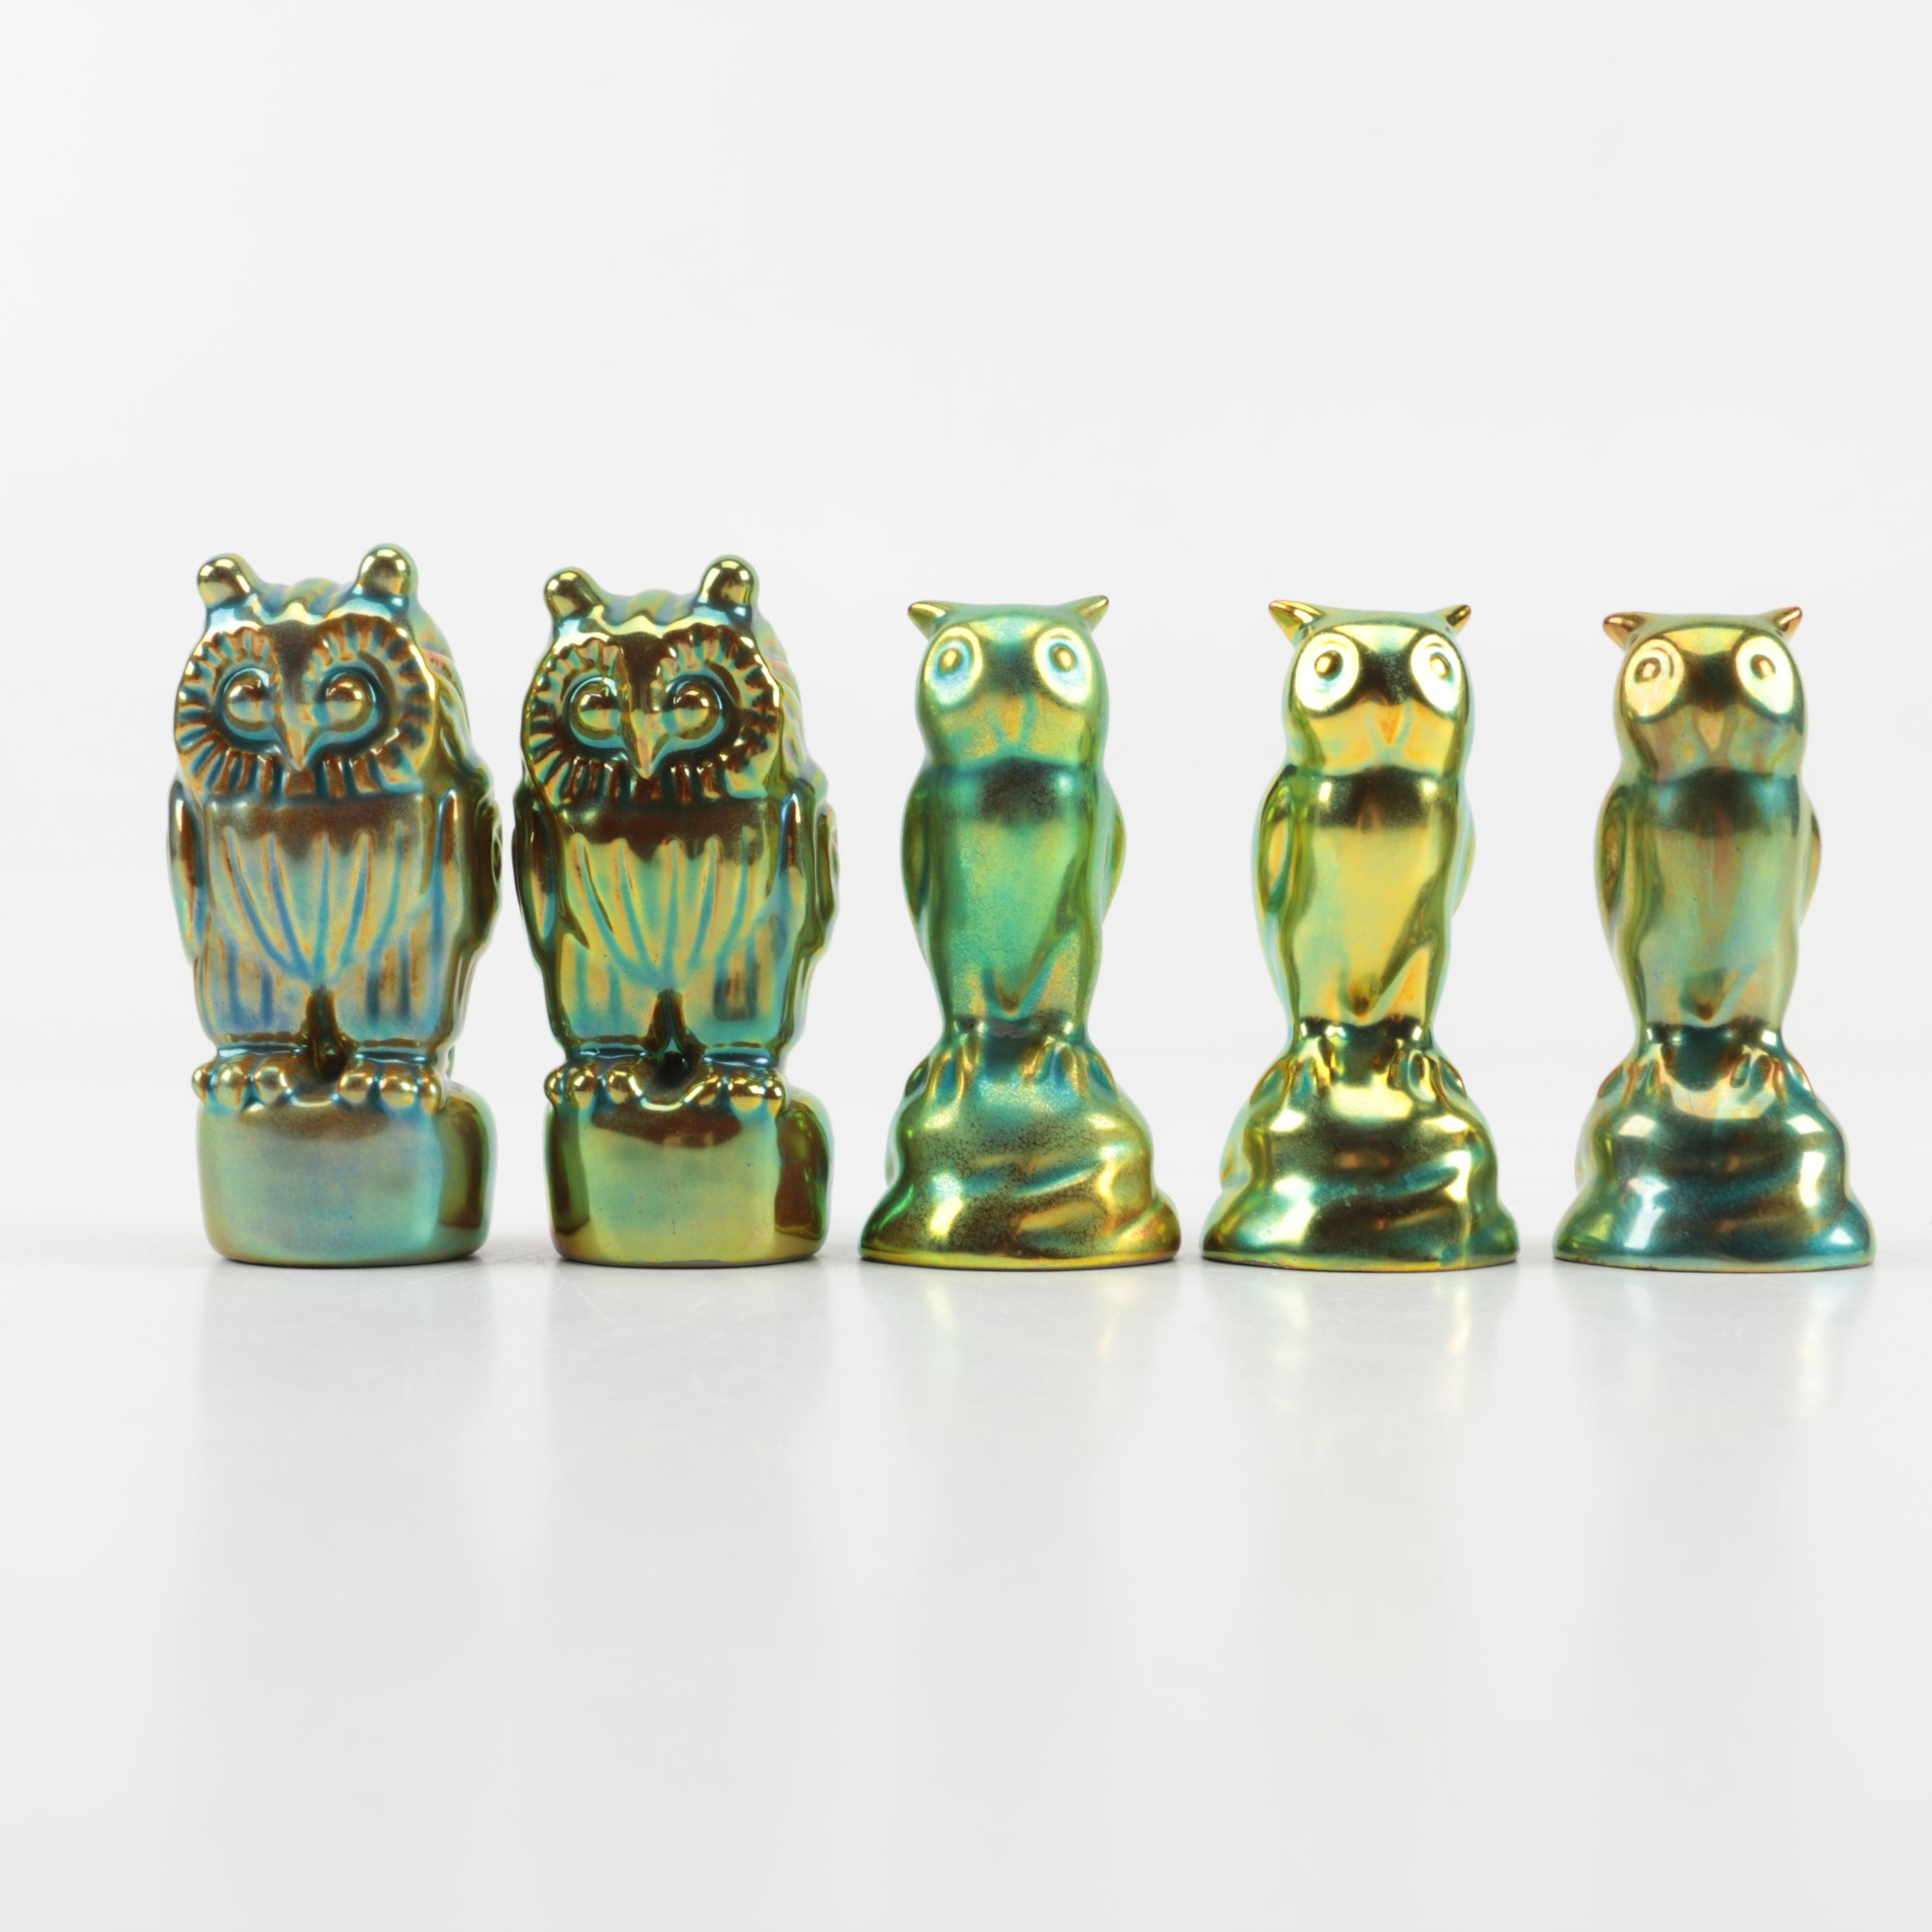 Vintage Zsolnay Pottery Ceramic Owl Figurines